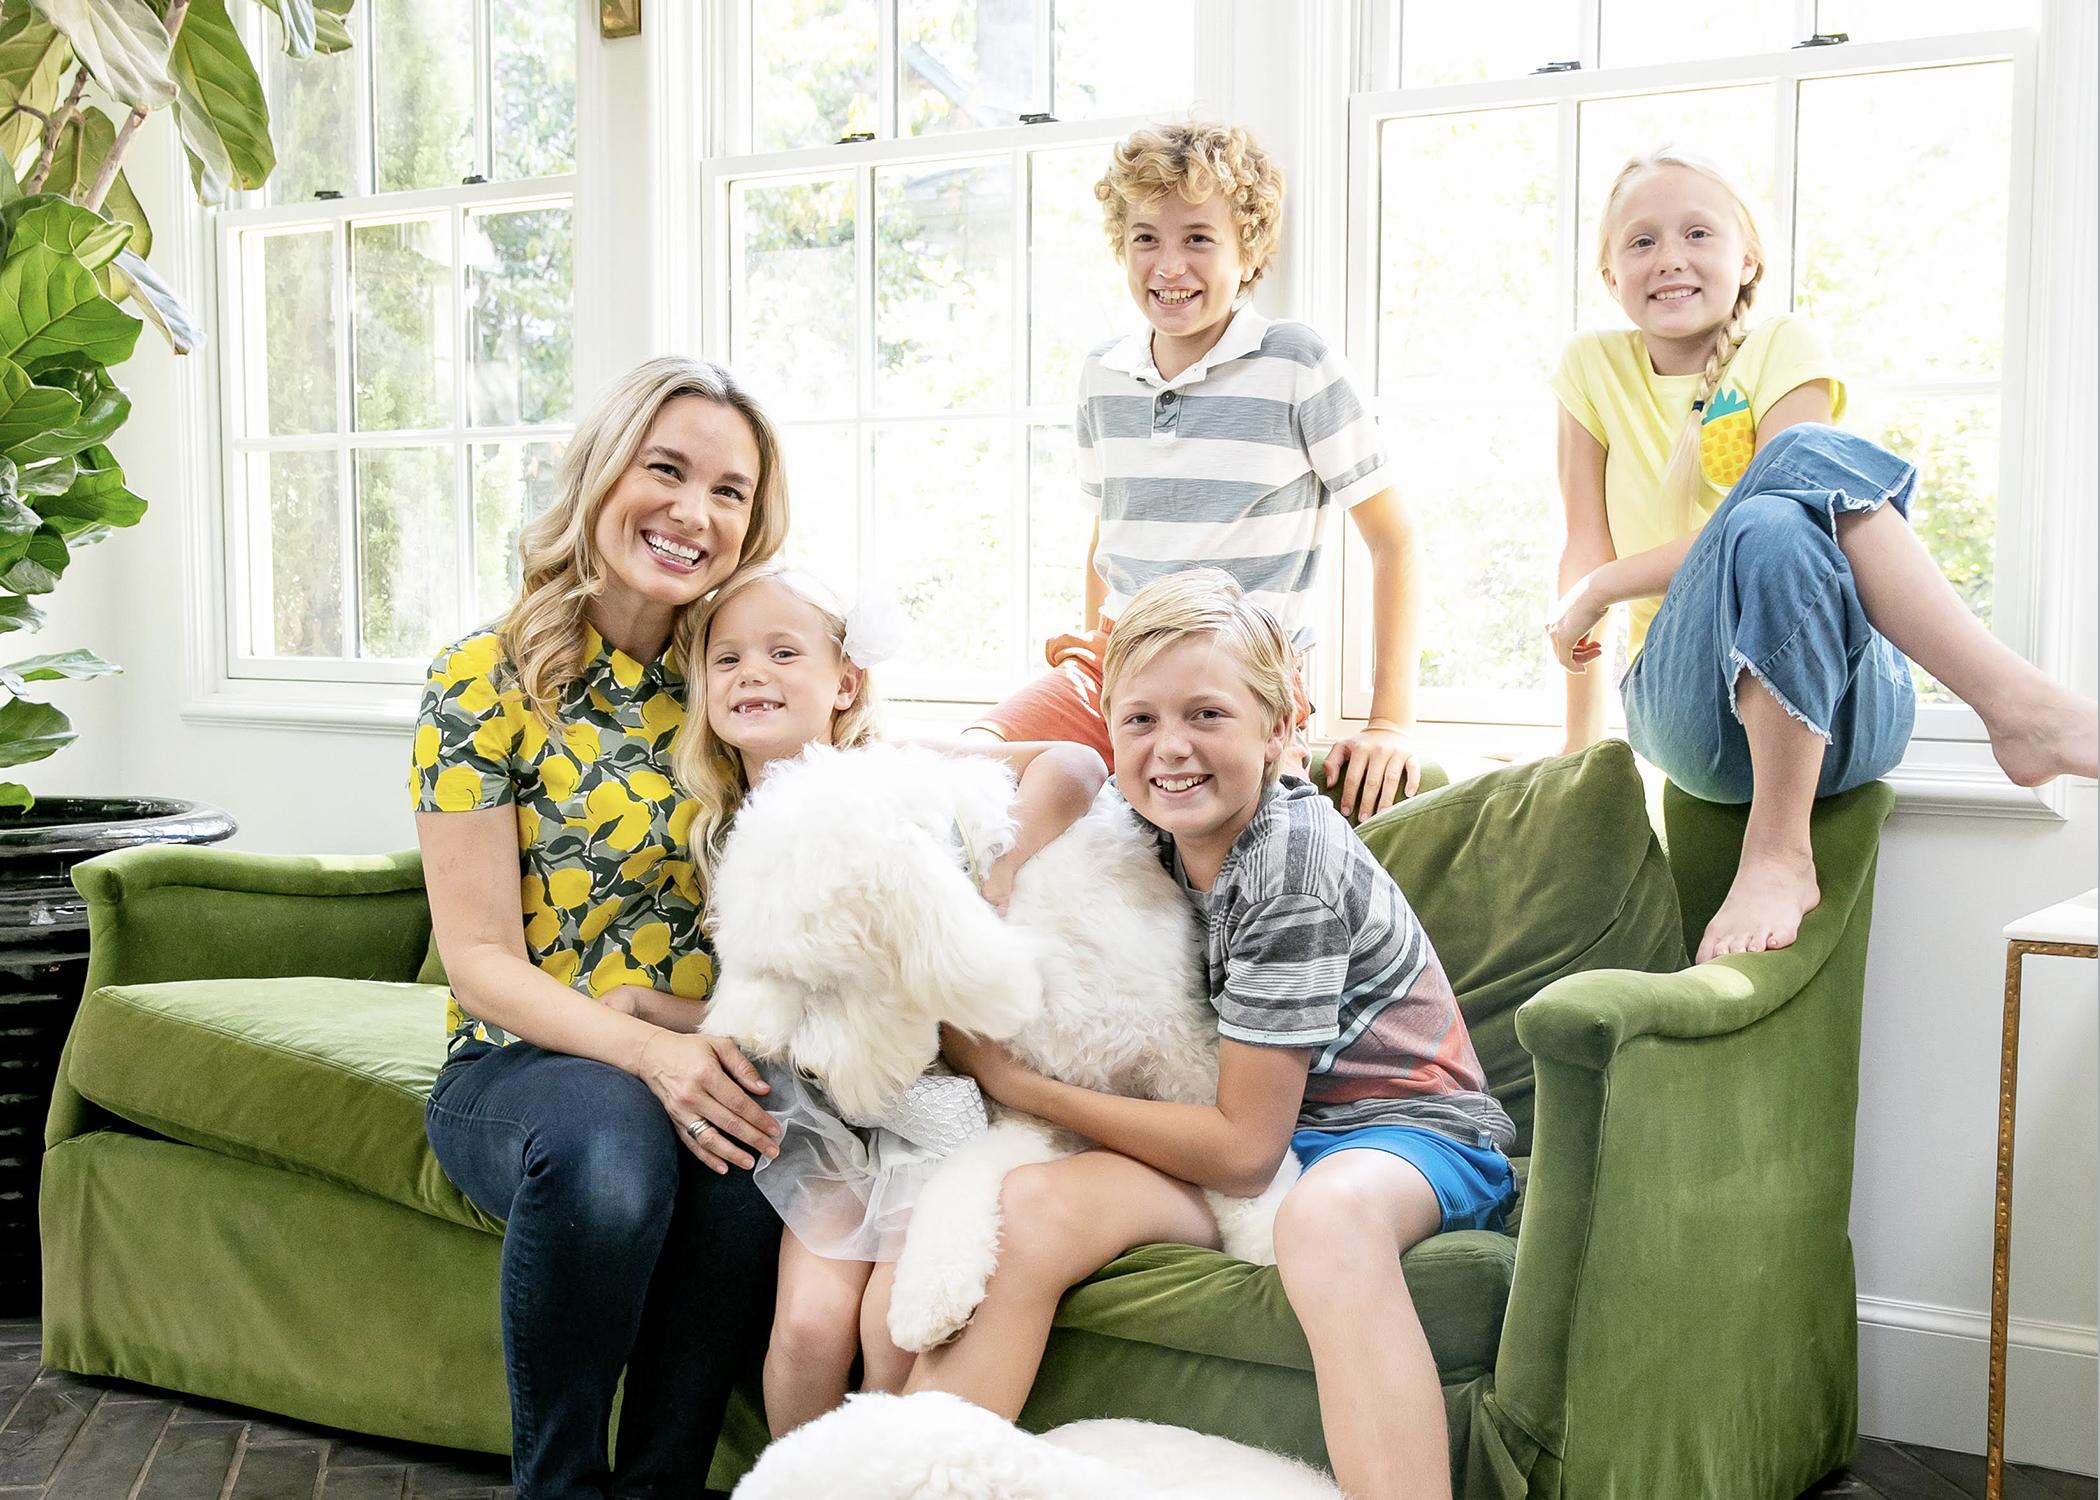 HGTV Star Grace Mitchell Spills the Truth on Making It All Happen - DFWChild